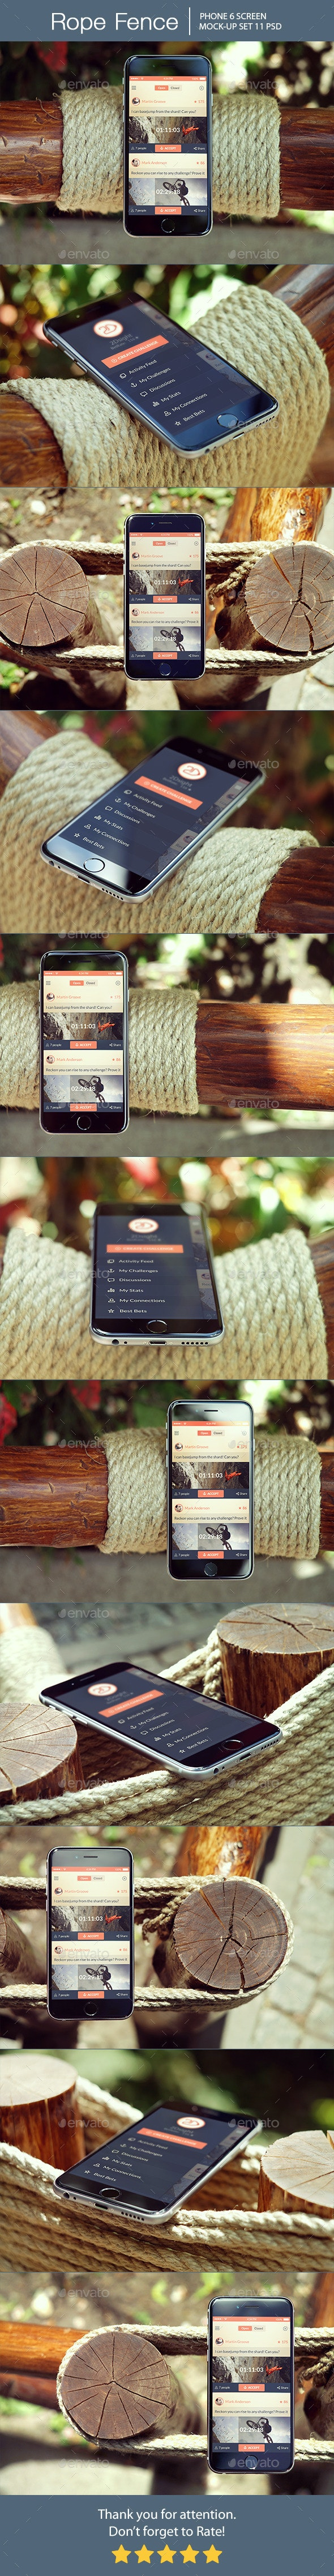 Rope Fence iPhone 6 Mockup - Mobile Displays